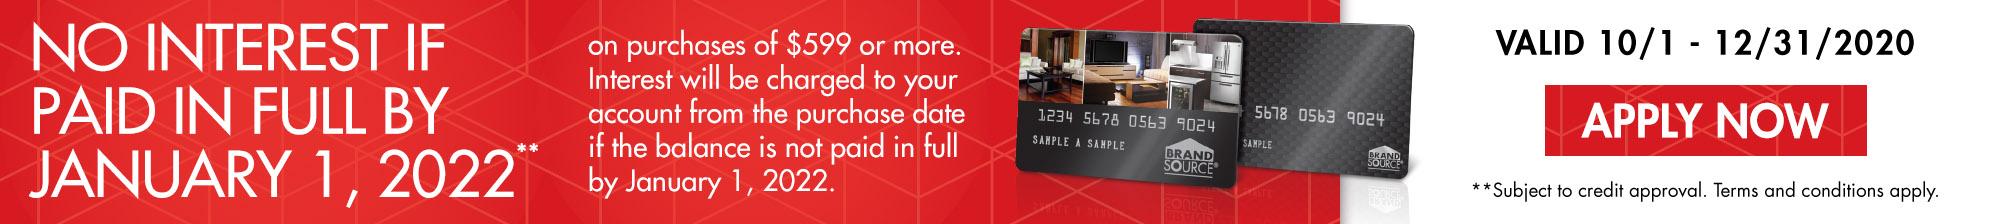 Brandsource Citi prepaid gift card promotion